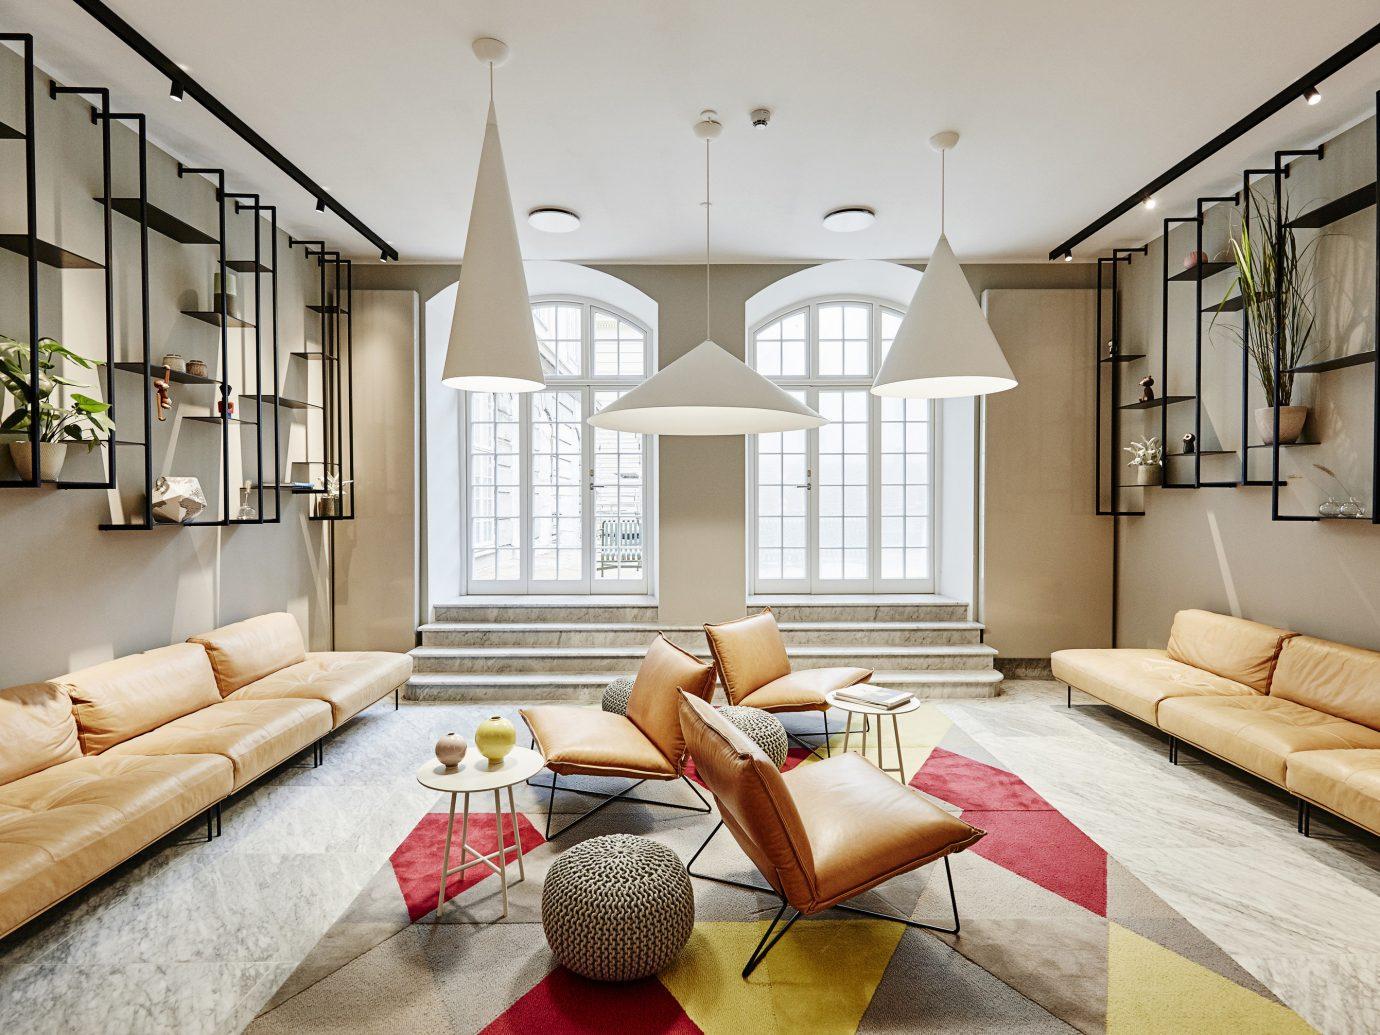 Architecture Beach Boutique Hotels Copenhagen Denmark Design Fall Travel Luxury News Summer Trip